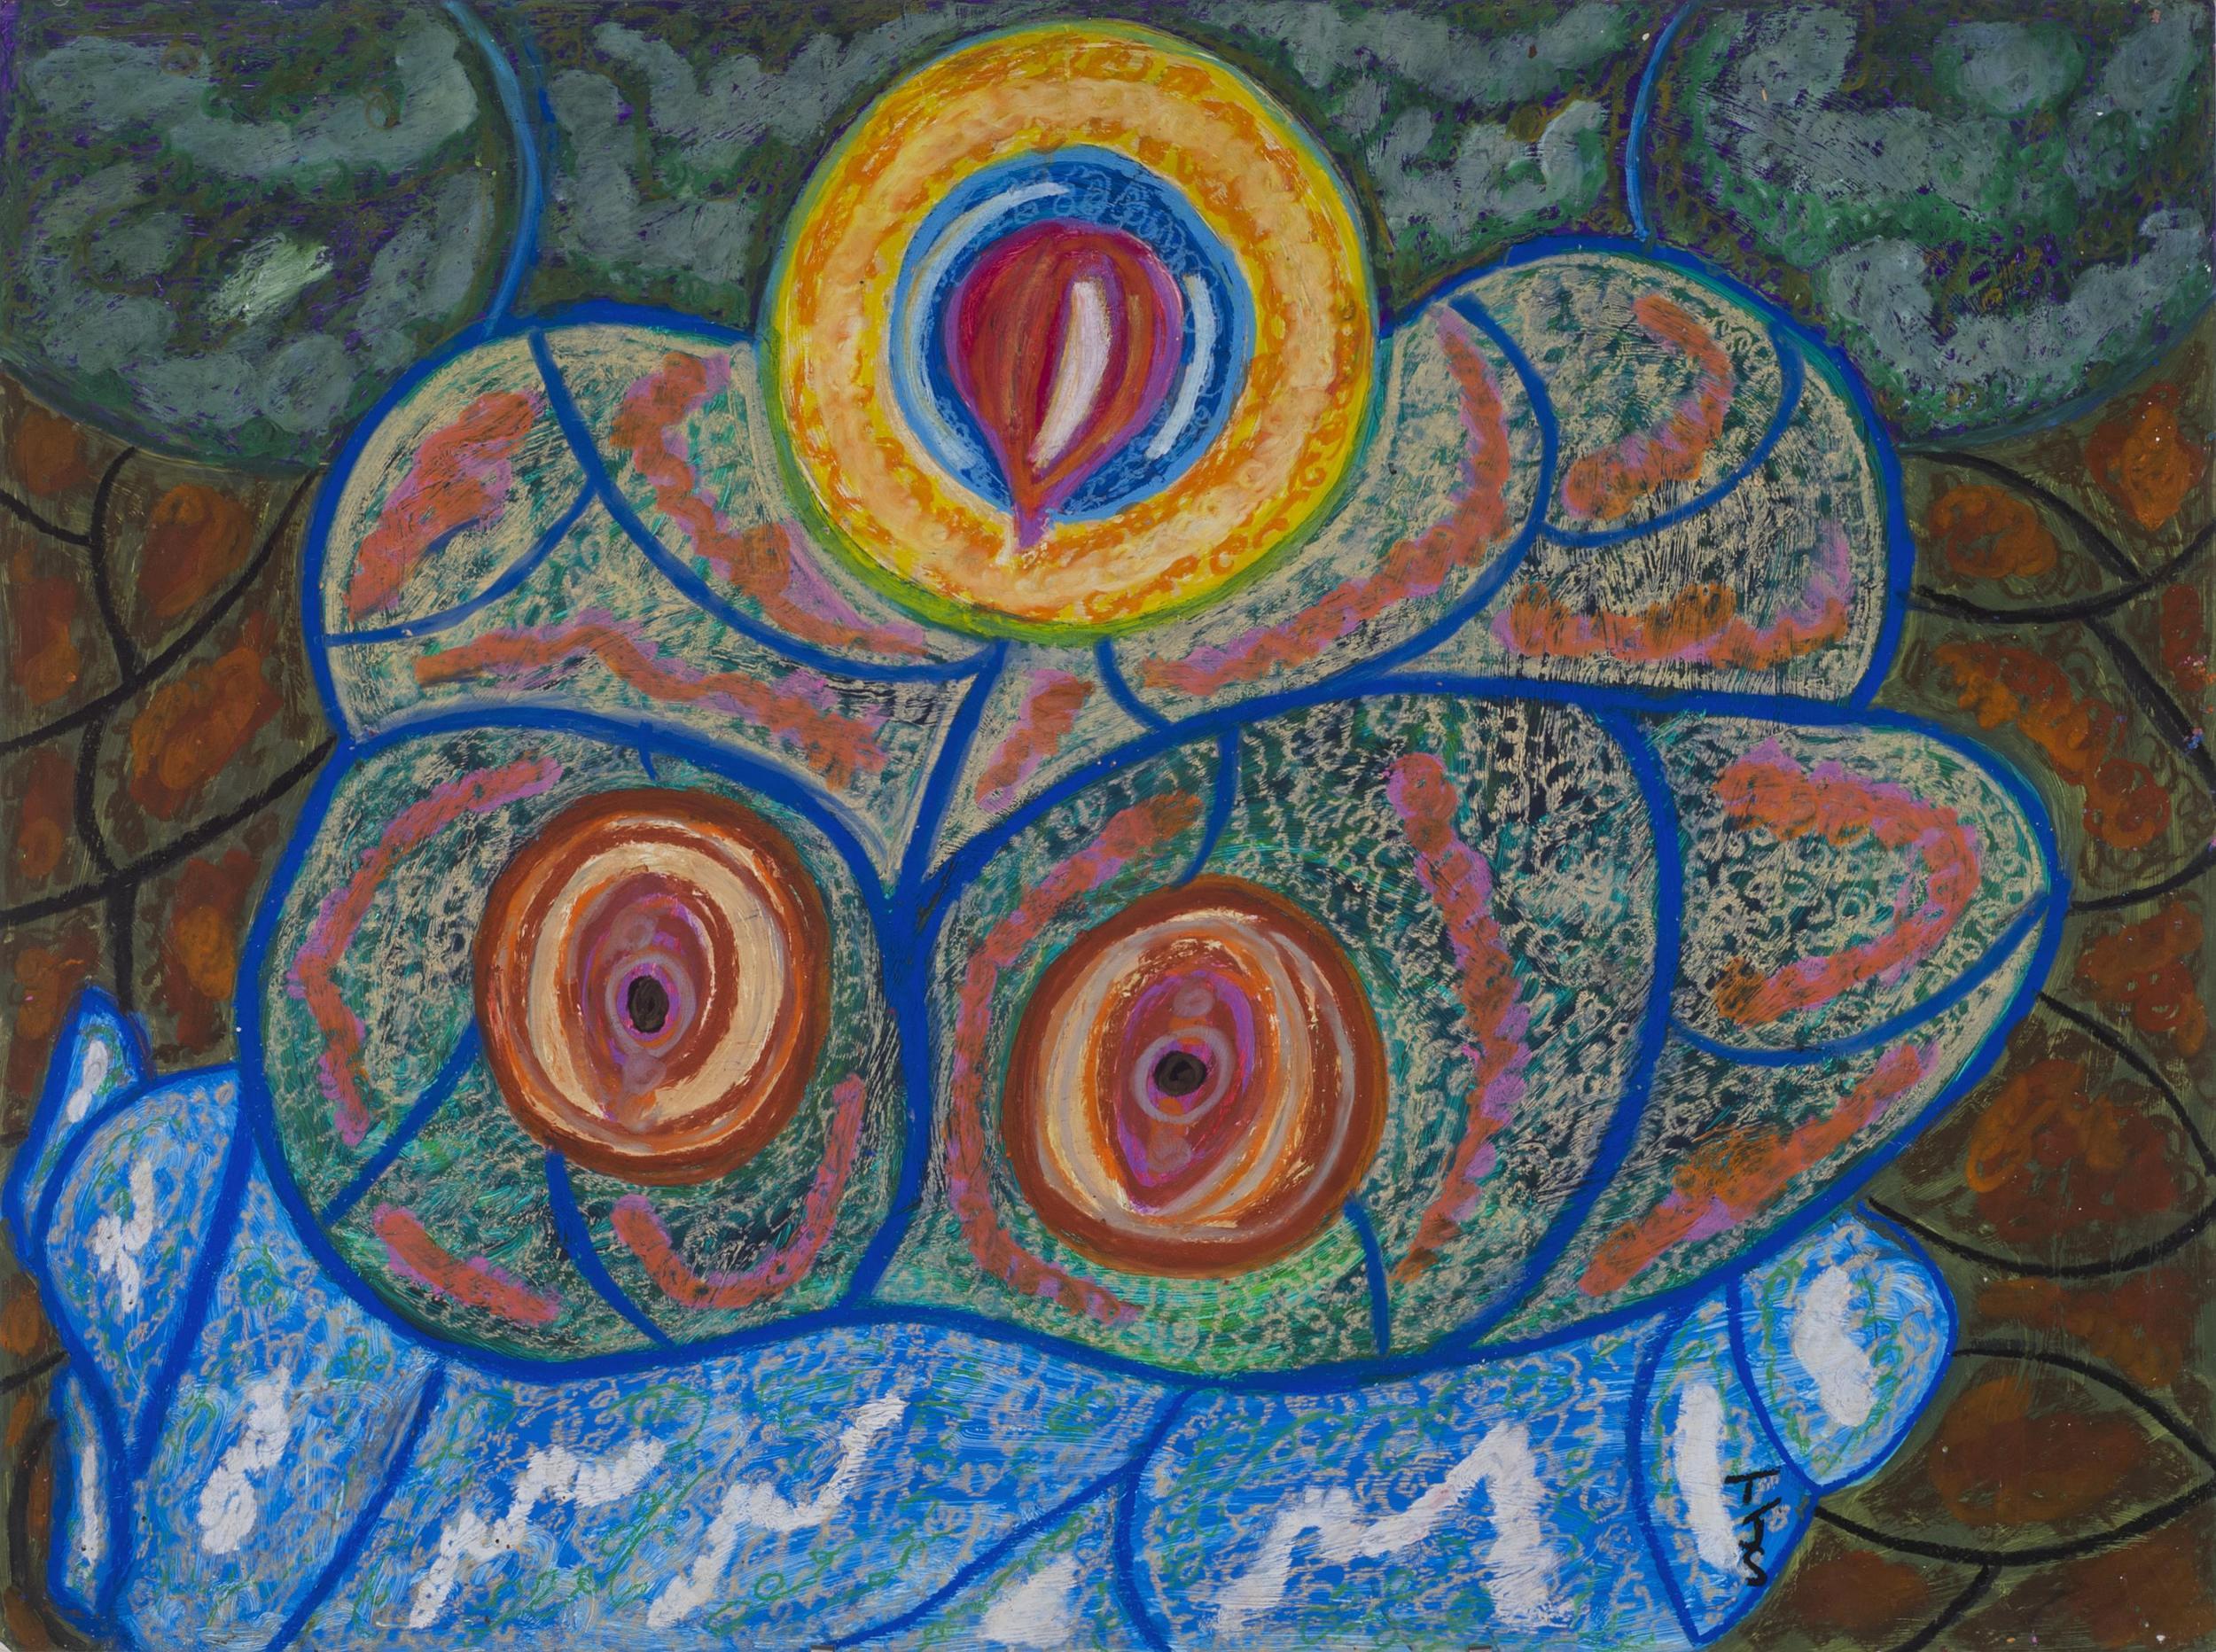 Anthony Joseph Salvatore    Psalms 30, v.2  , 1994 Oil stick, acrylic/illustration board 40 x 30 inches 101.6 x 76.2 cm JS 322